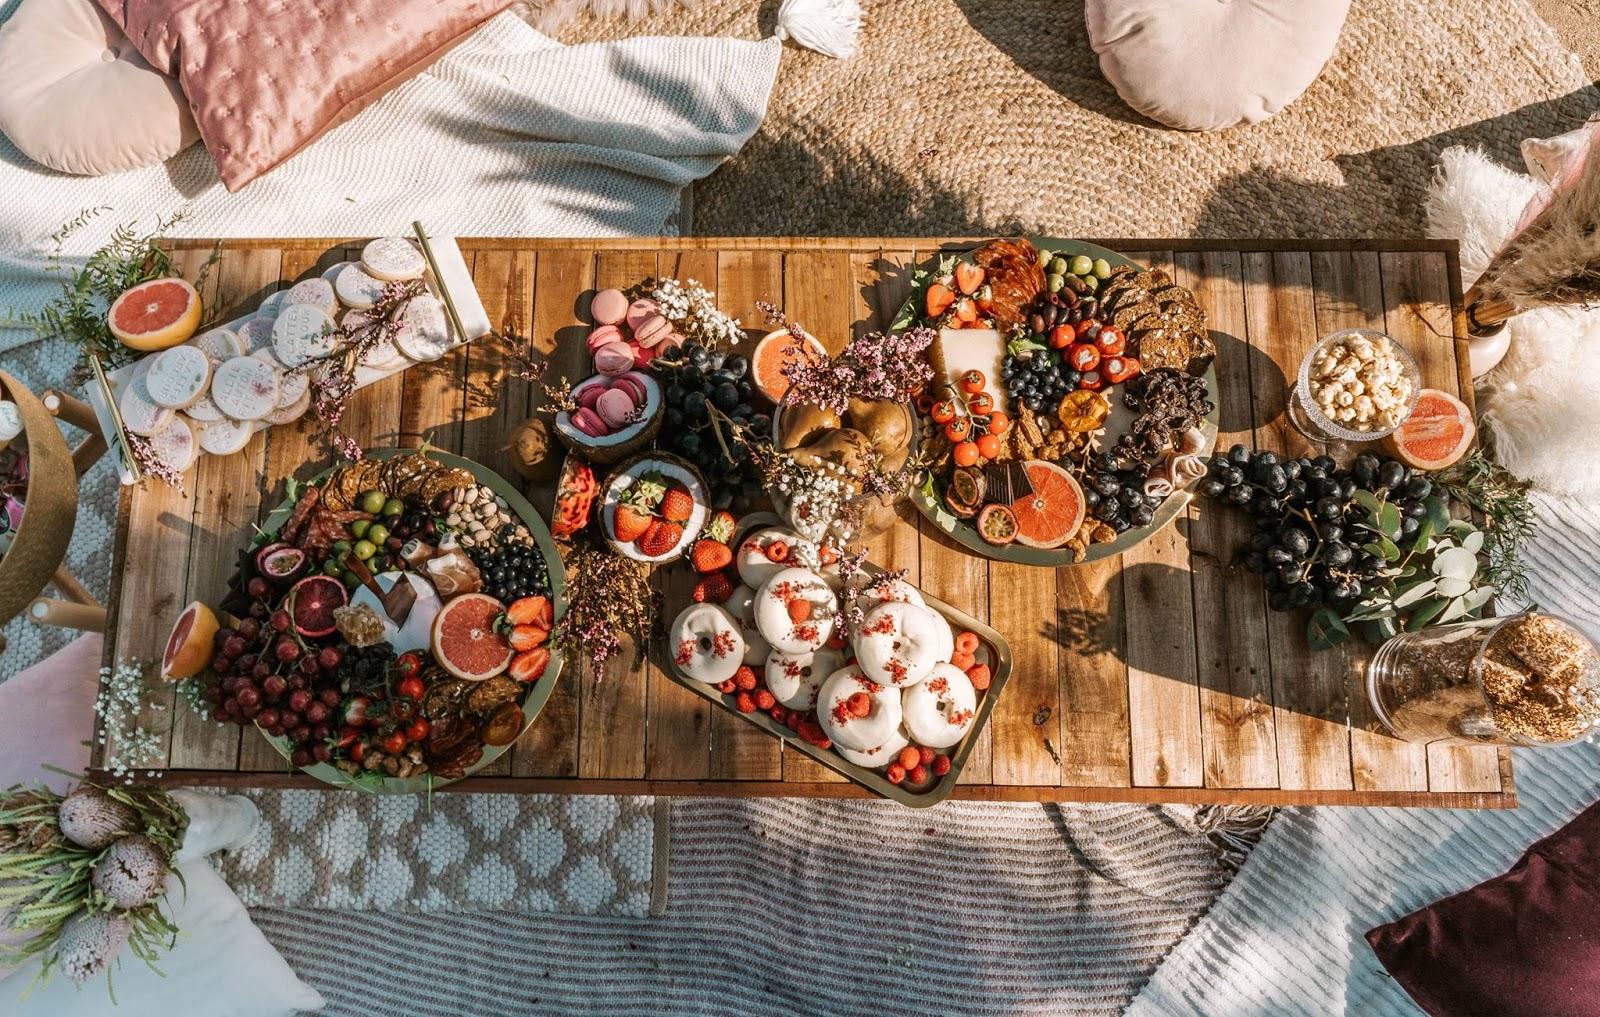 TEN OF THE BEST WEDDING GRAZING TABLES | BRISBANE QLD